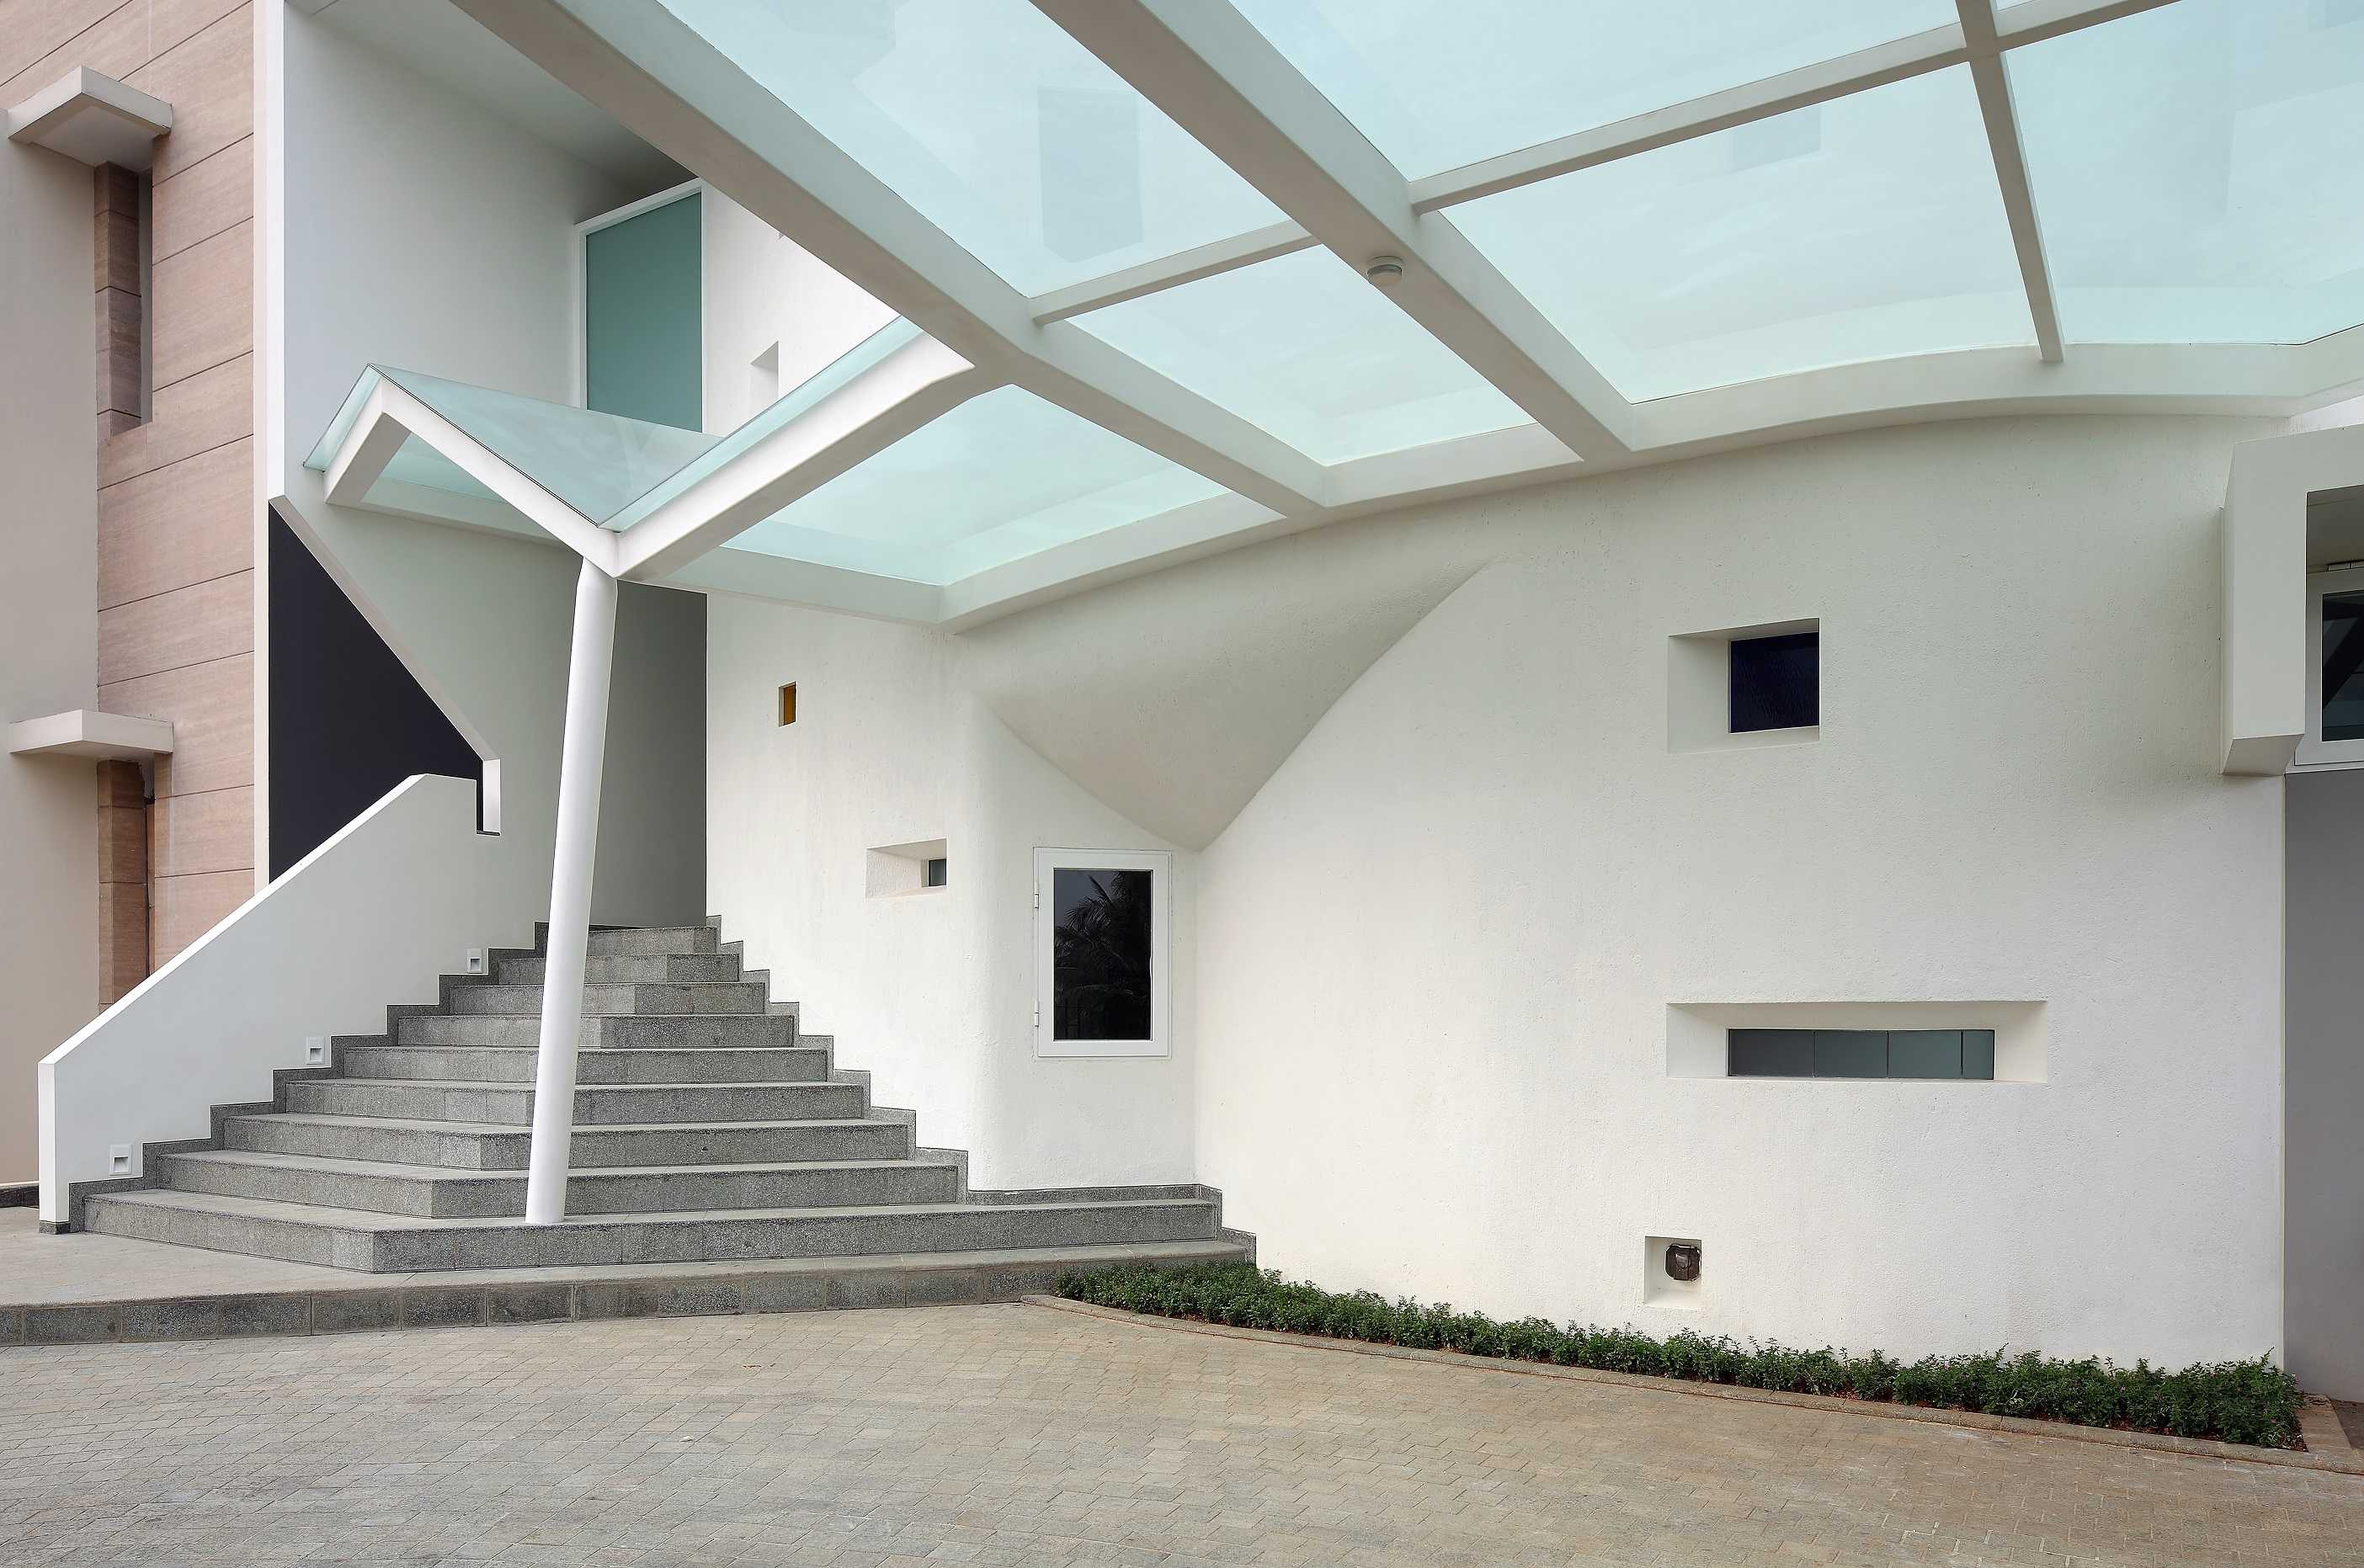 Irianto Purnomo Hadi Ss Residence  Gading Serpong, Jl. Boulevard Raya Gading Serpong, Klp. Dua, Tangerang, Banten 15810, Indonesia Terrace   30279